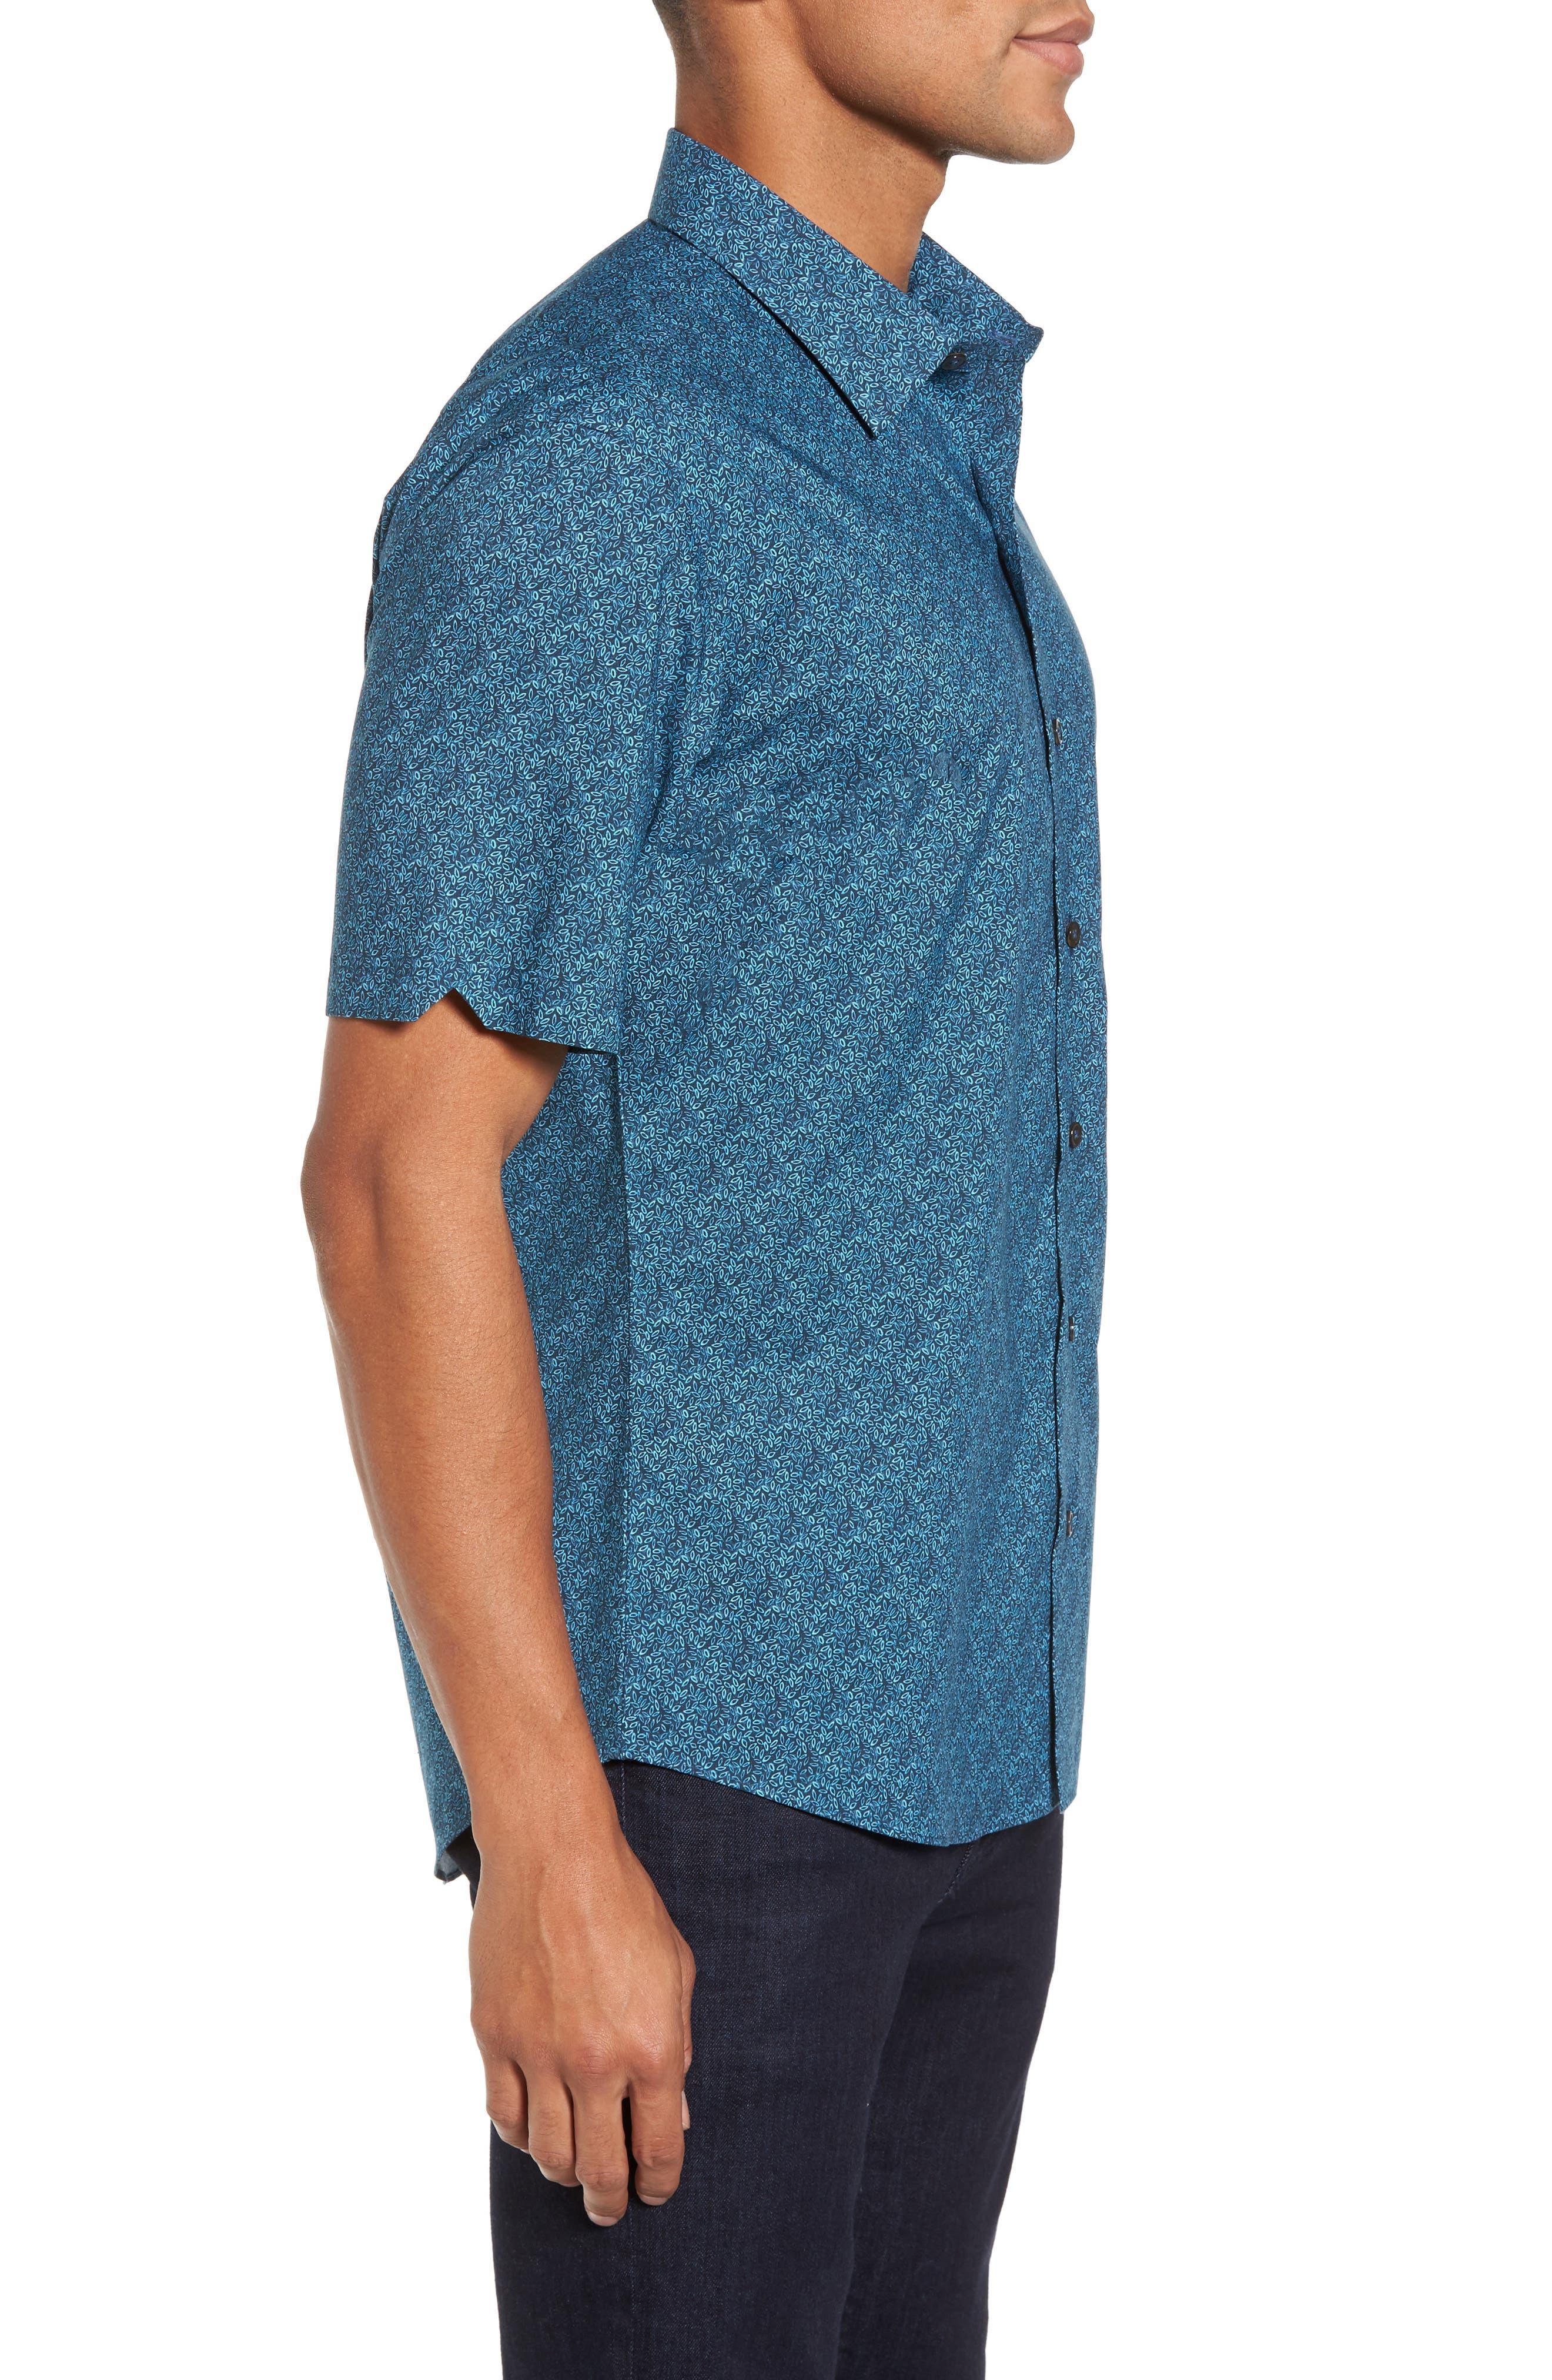 Alternate Image 3  - Zachary Prell Machnee Slim Fit Print Sport Shirt